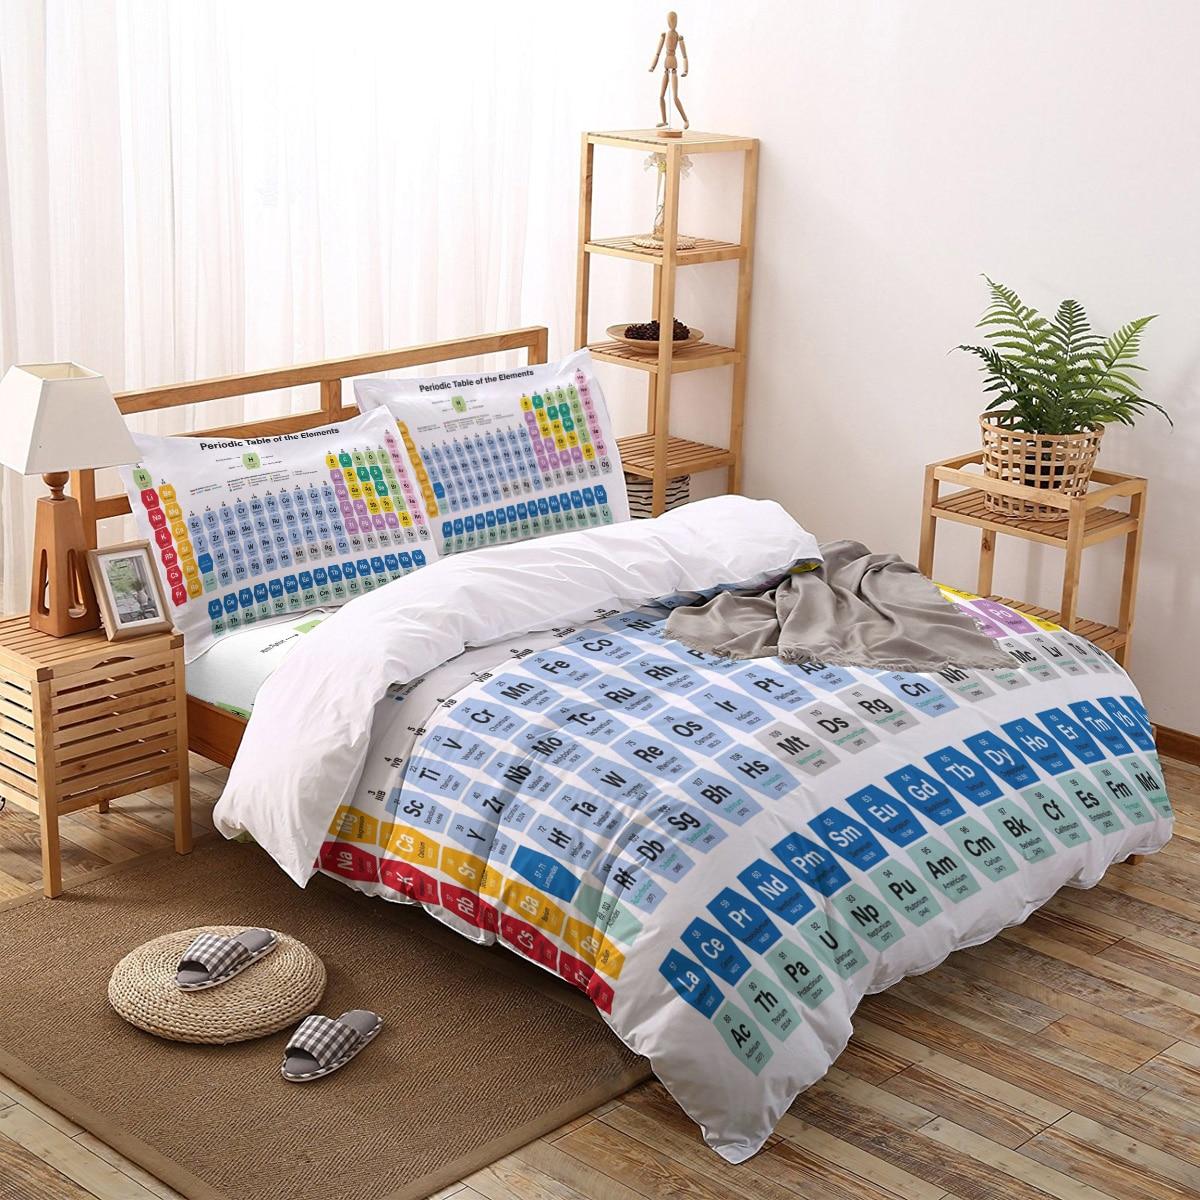 Juego de fundas de edredón de Mesa Periódica 2/3/18 Uds juego de cama sábana de cama funda para almohada Set